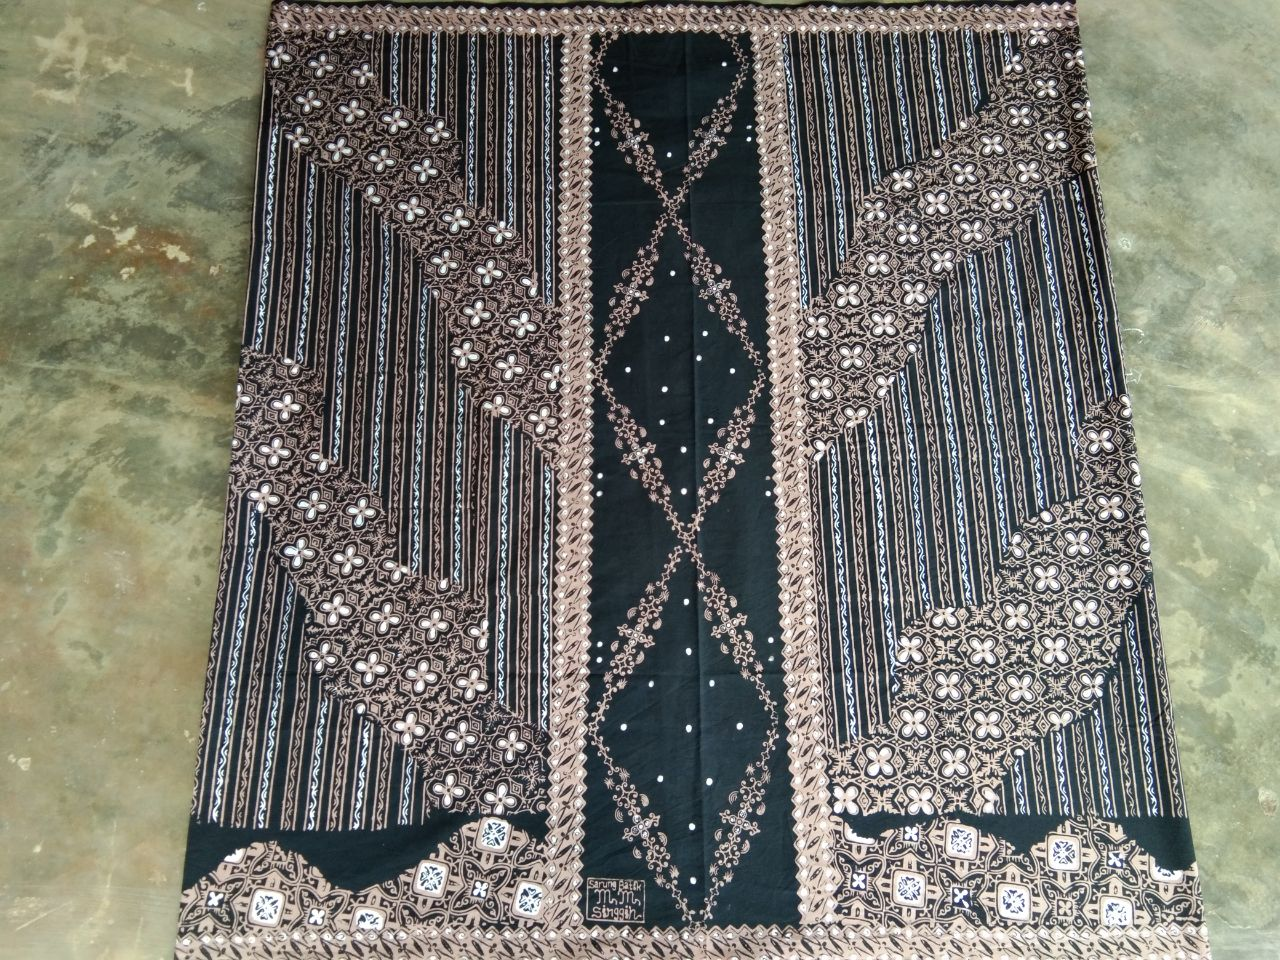 sarung batik cap warna dasar hitam